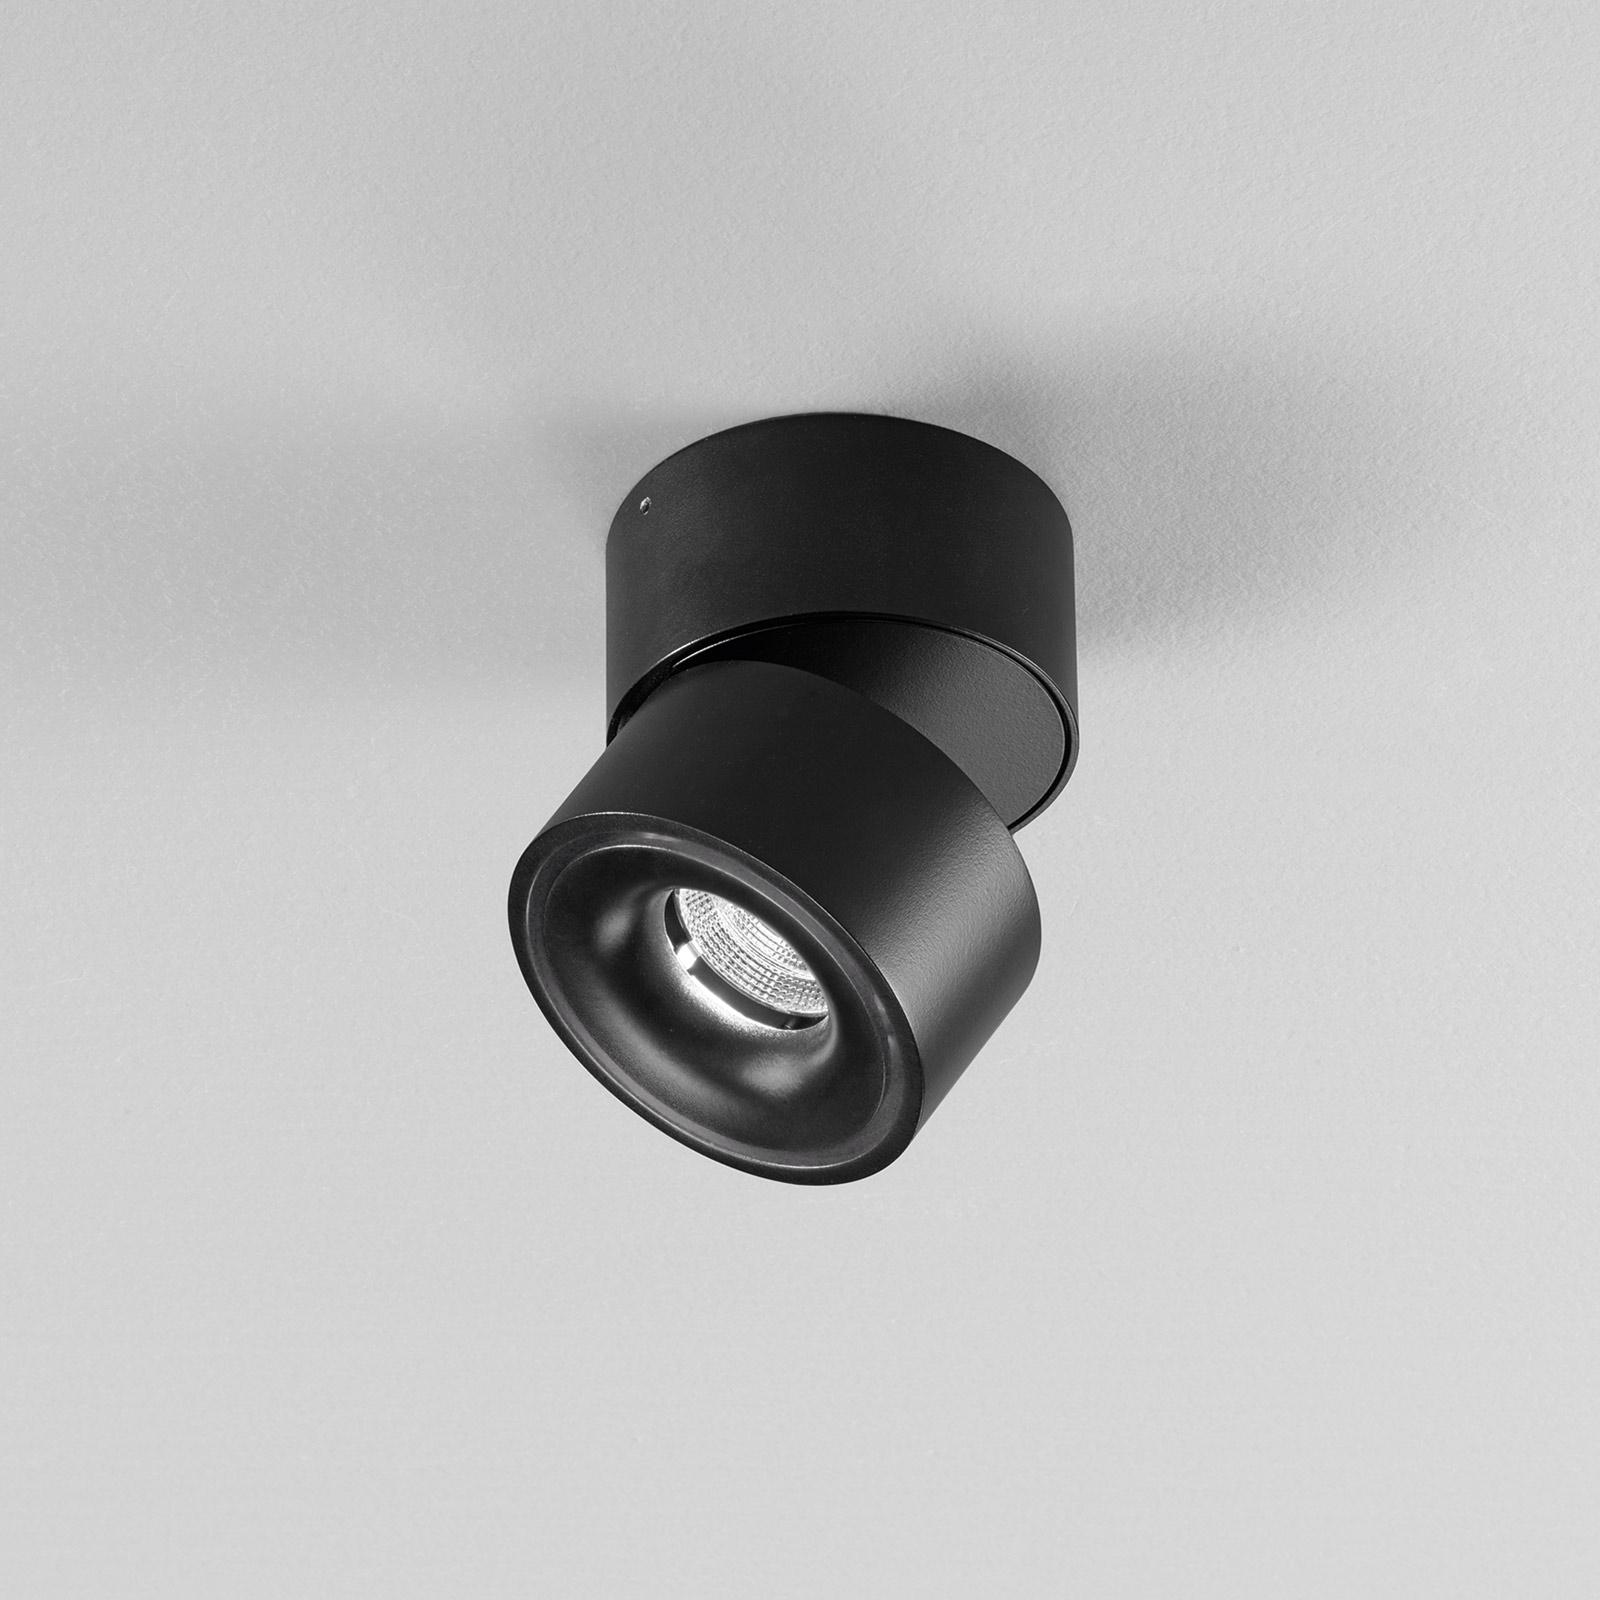 Egger Clippo LED-Deckenspot dim-to-warm schwarz